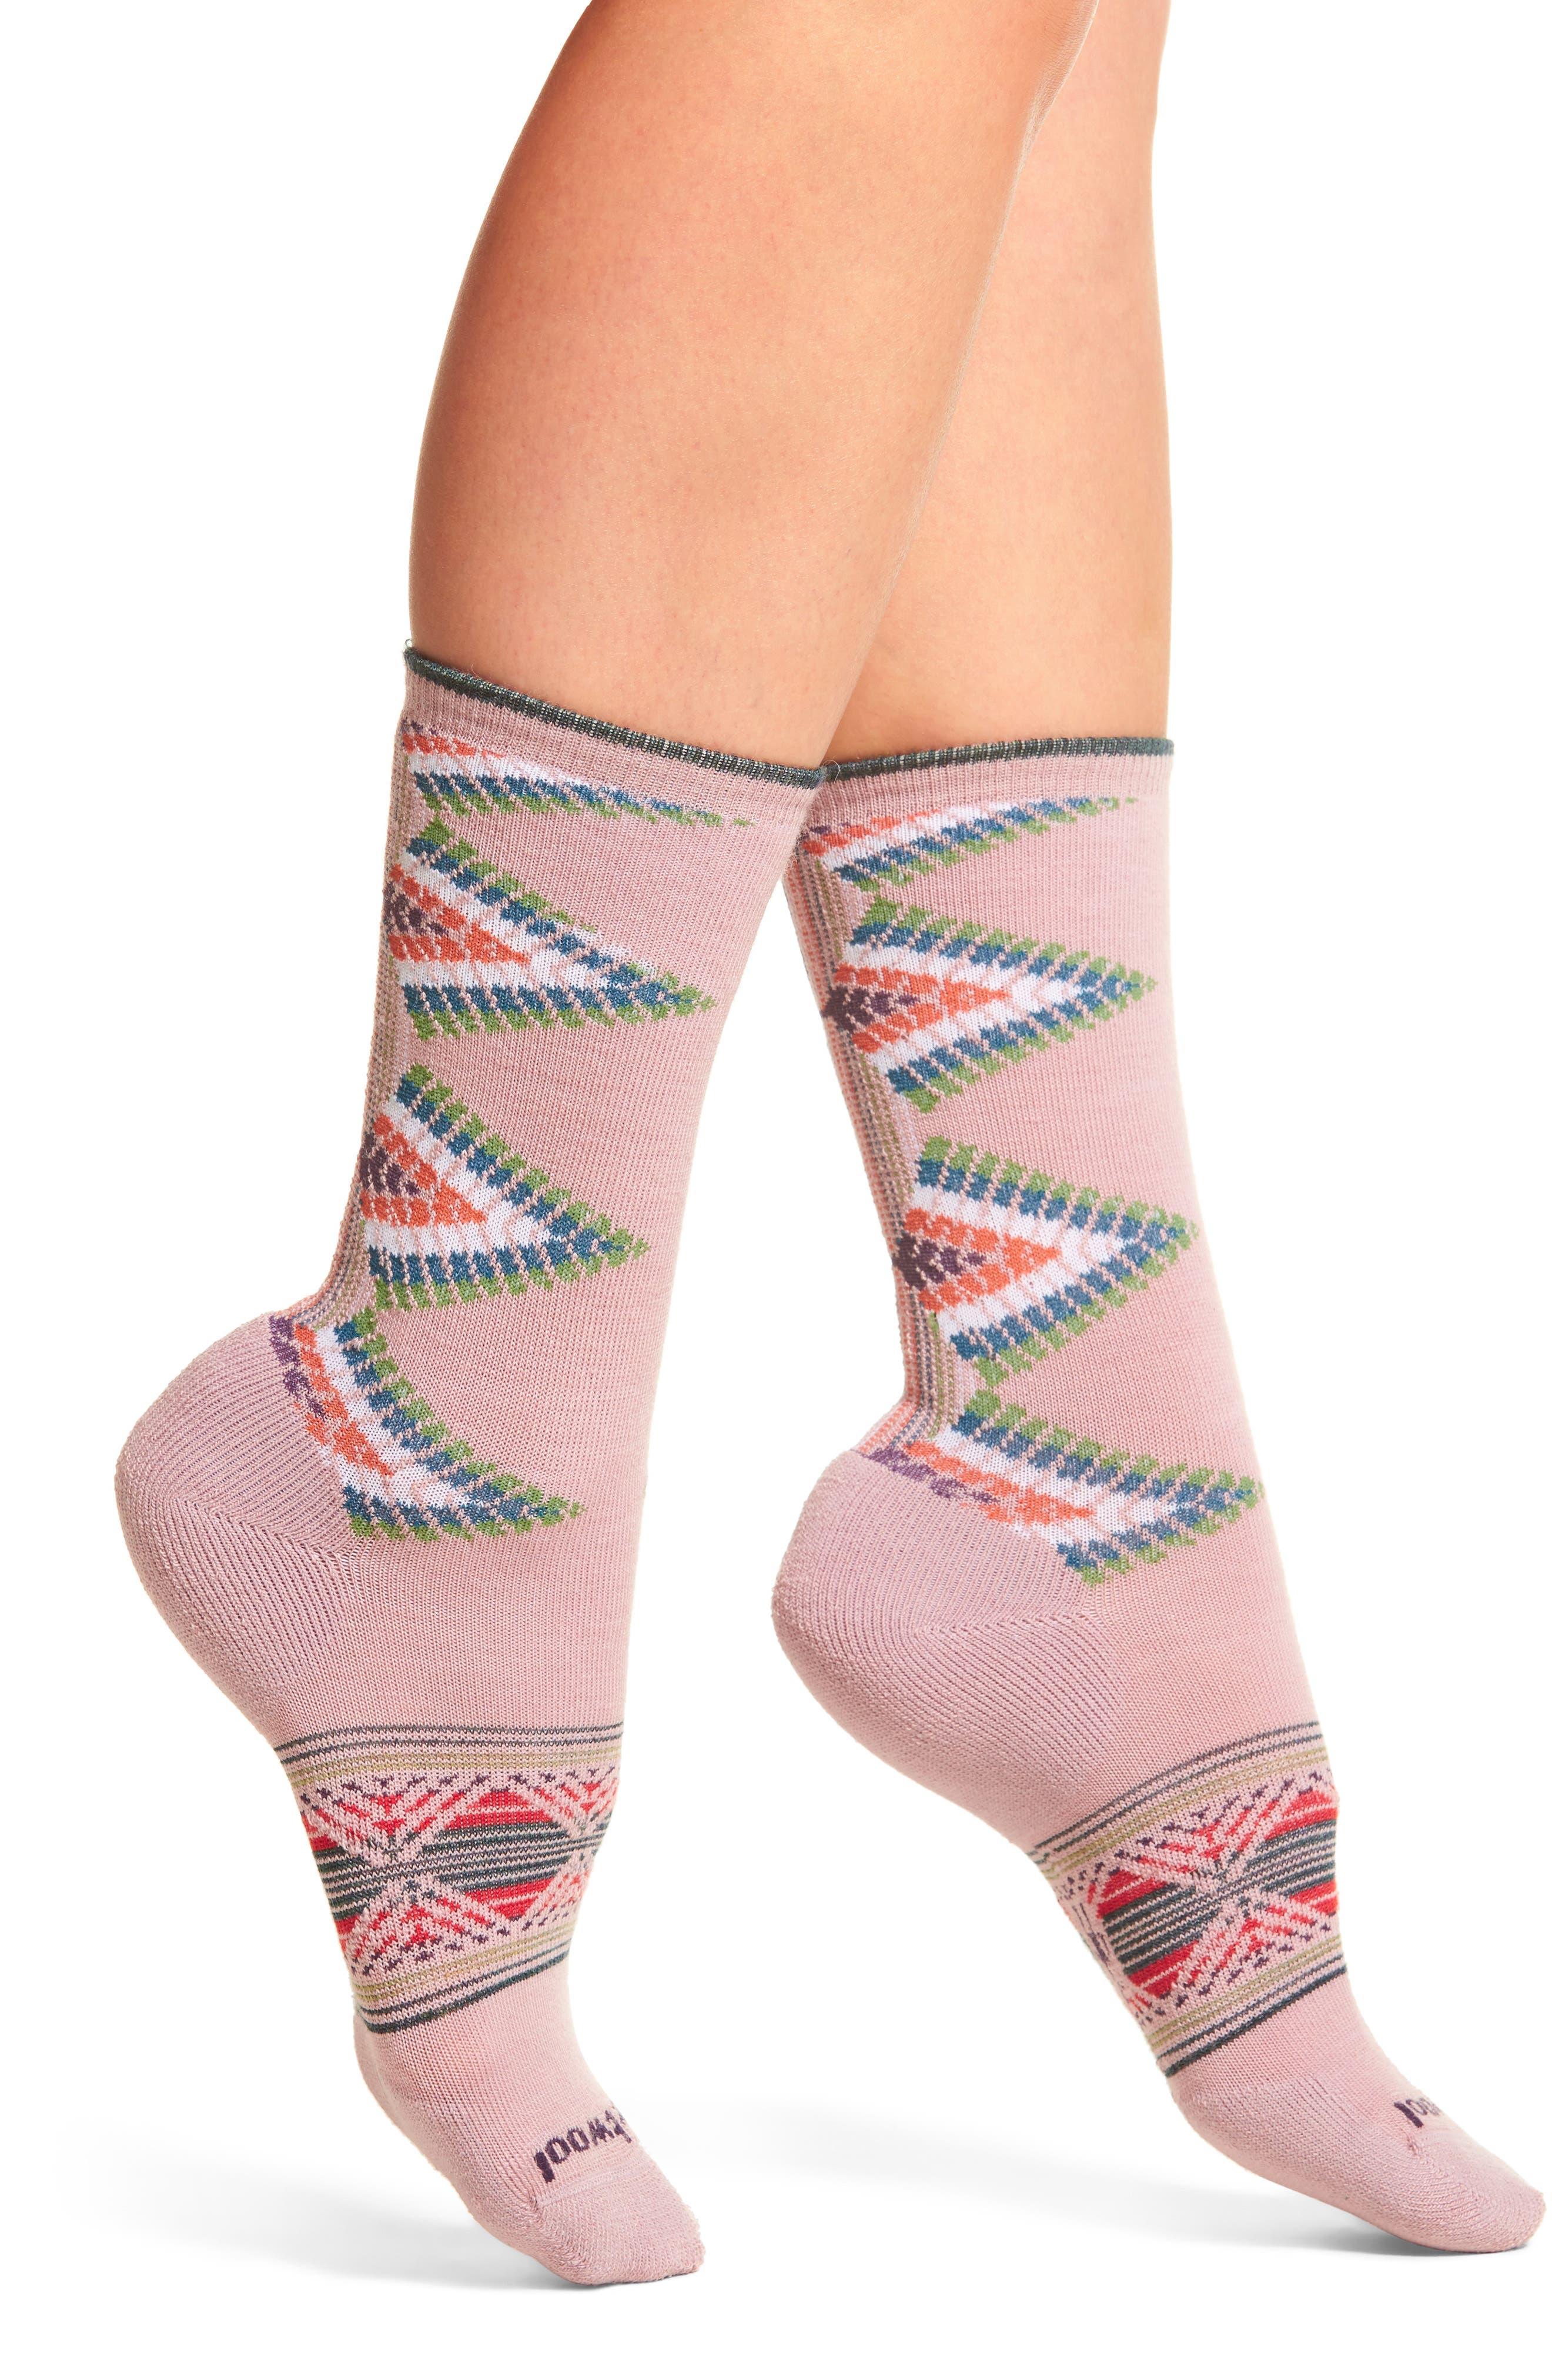 Alternate Image 1 Selected - Smartwool Tiva Crew Socks